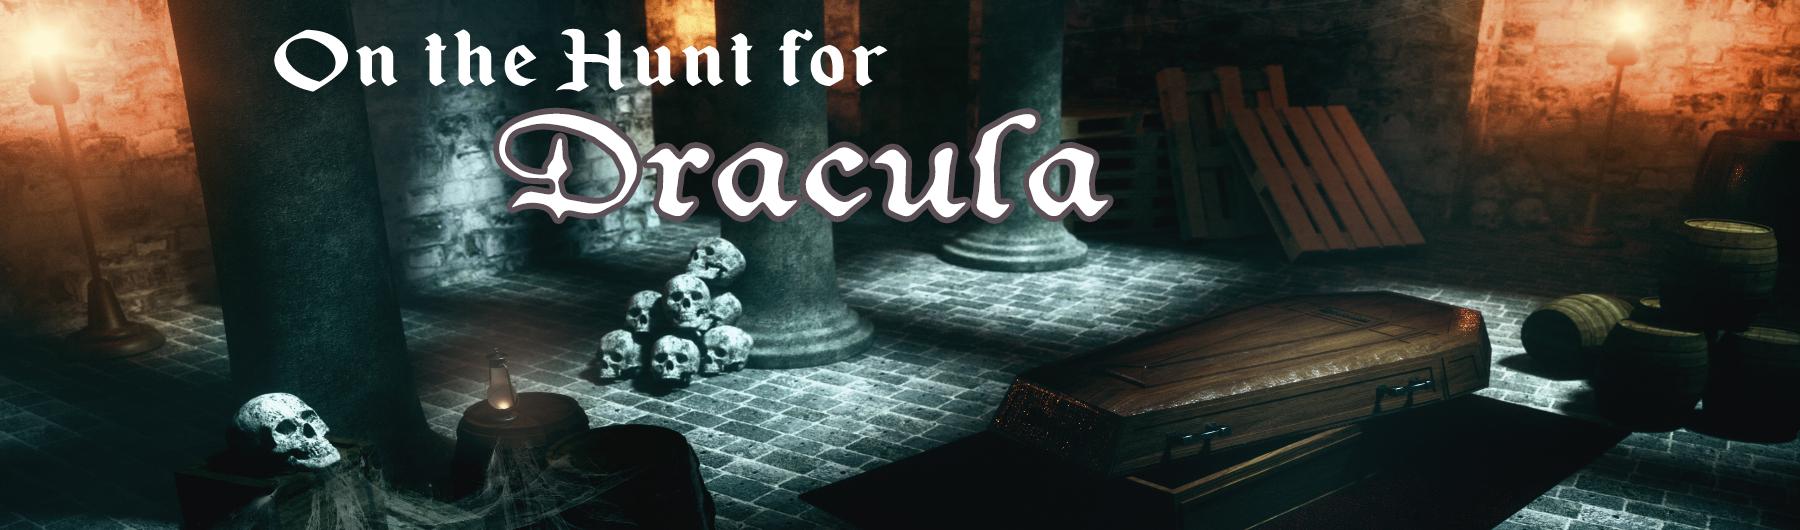 On the Hunt for Dracula - Dark History & Horror